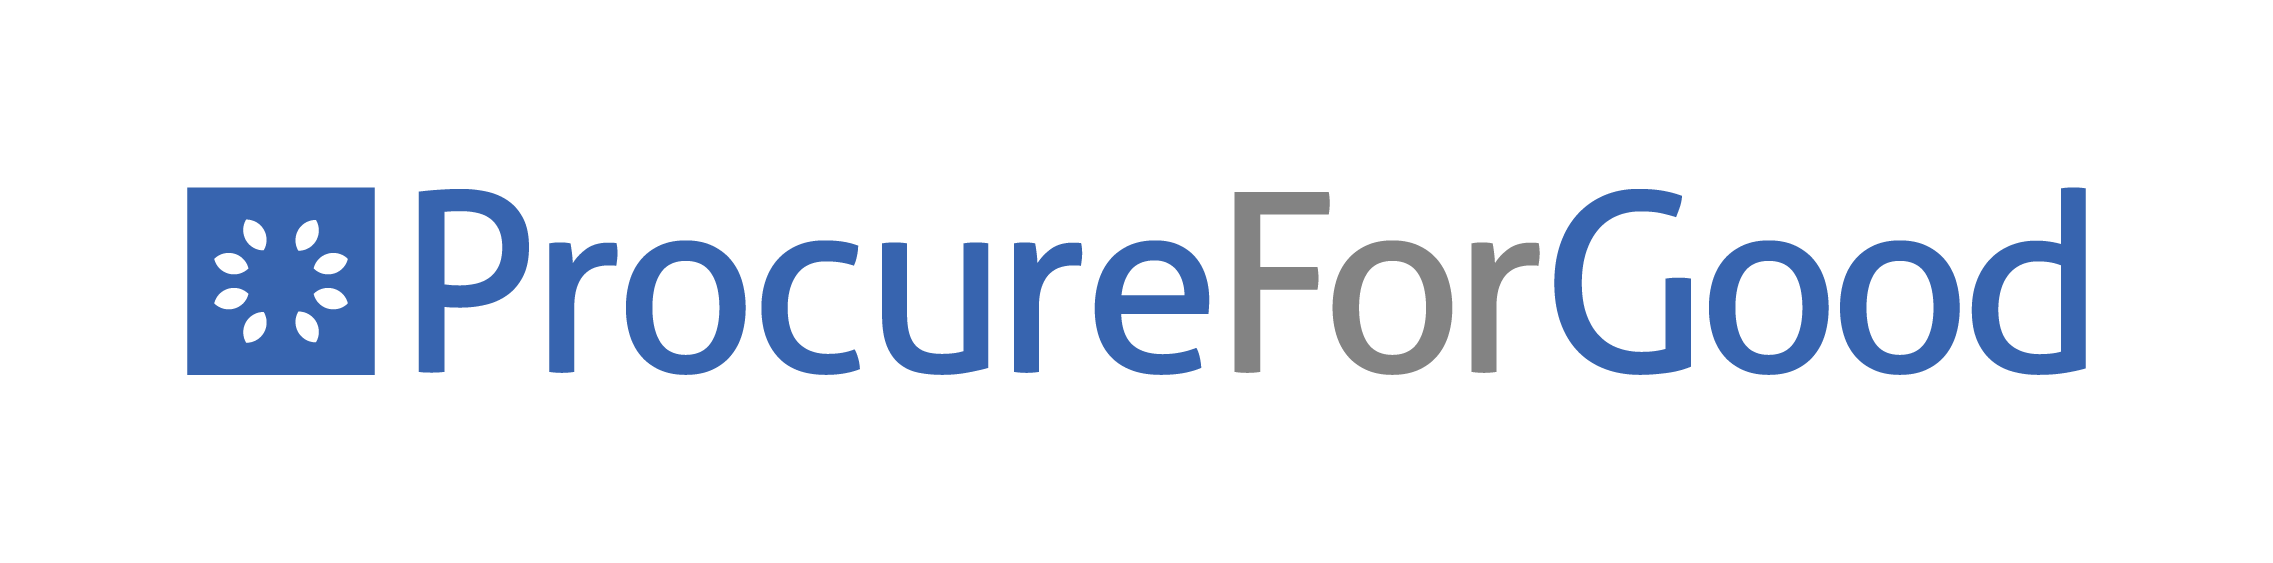 Procure For Good logo 2019 RGB